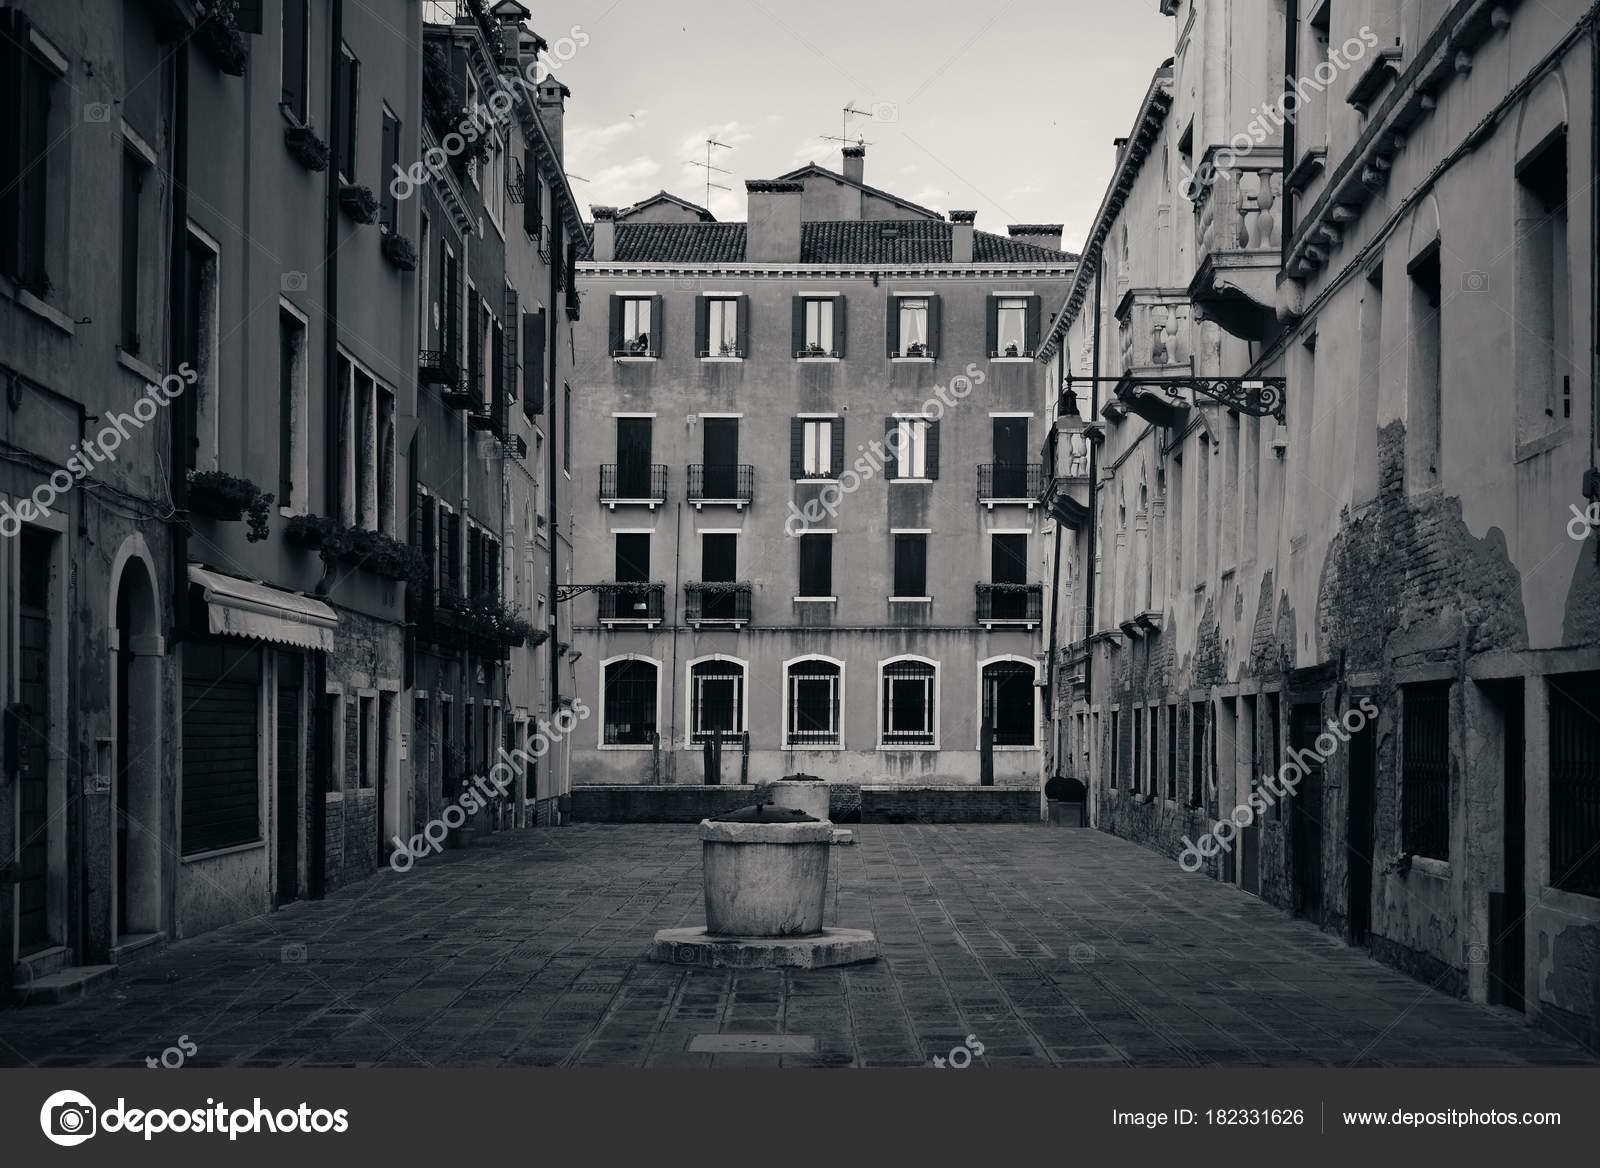 Venice Courtyard Well Stock Photo C Rabbit75 Dep 182331626